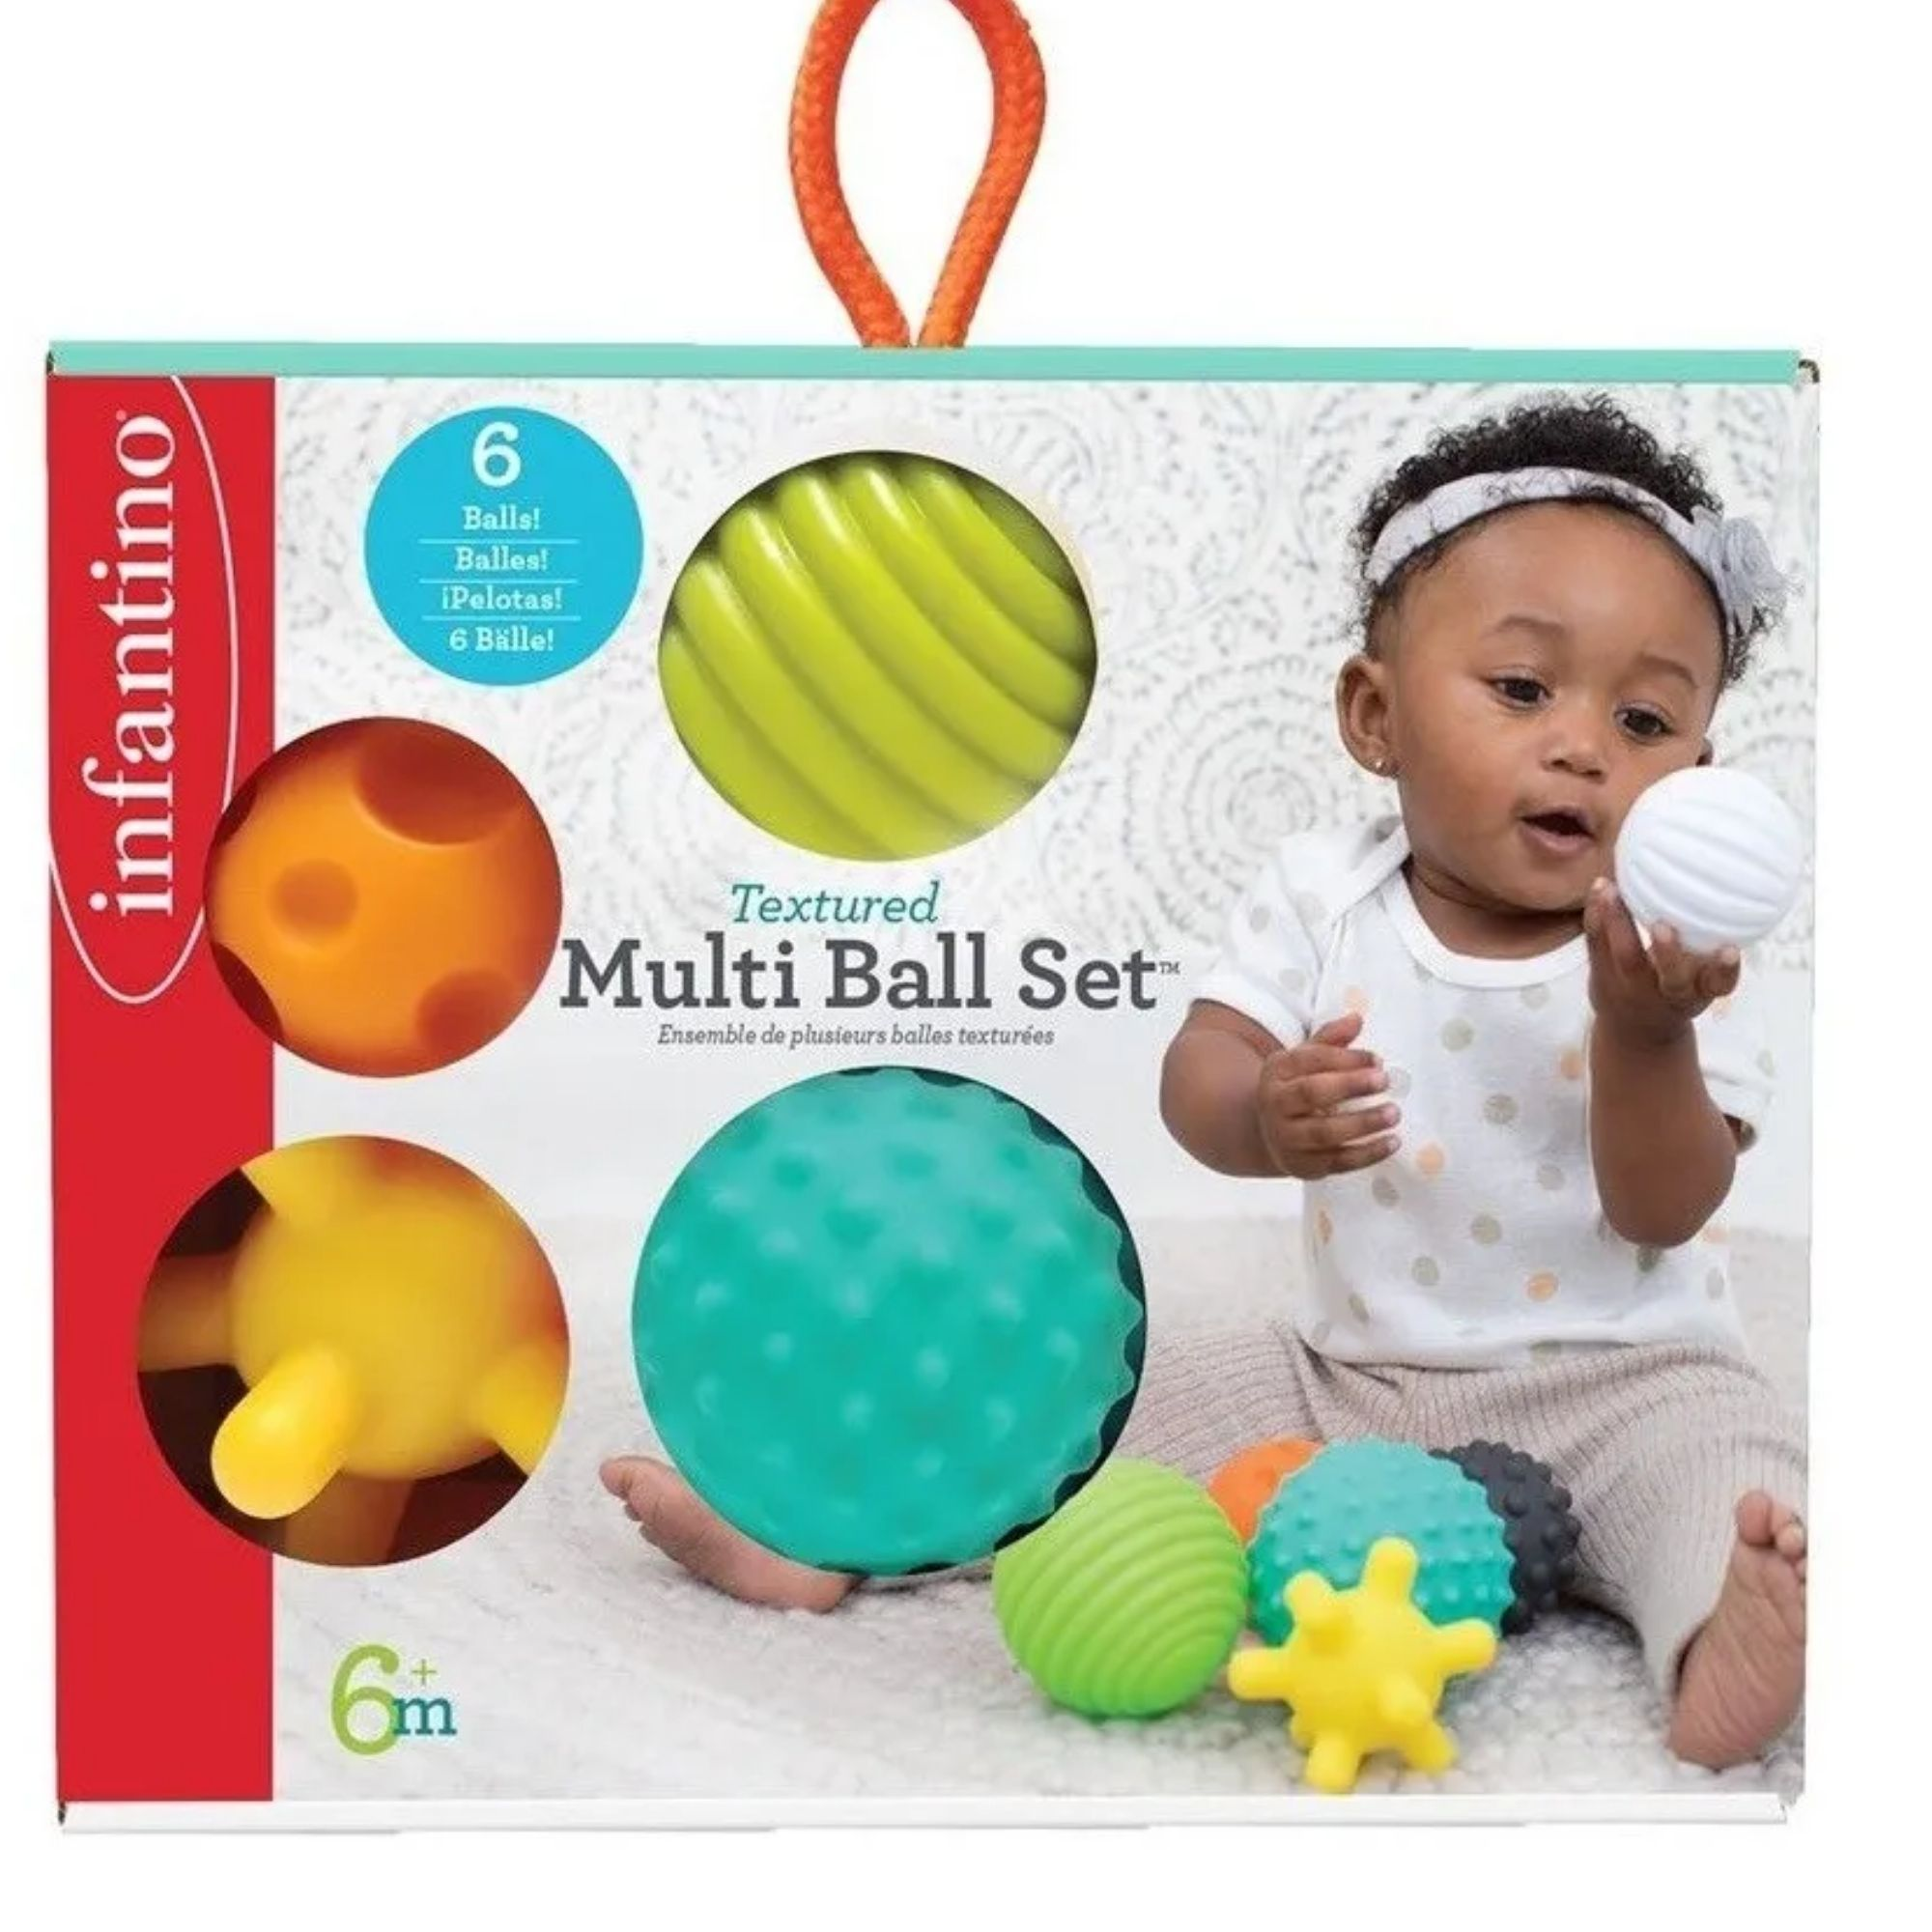 Brinquedo para bebê Bolas de silicone Infantino Texturizada  - Game Land Brinquedos